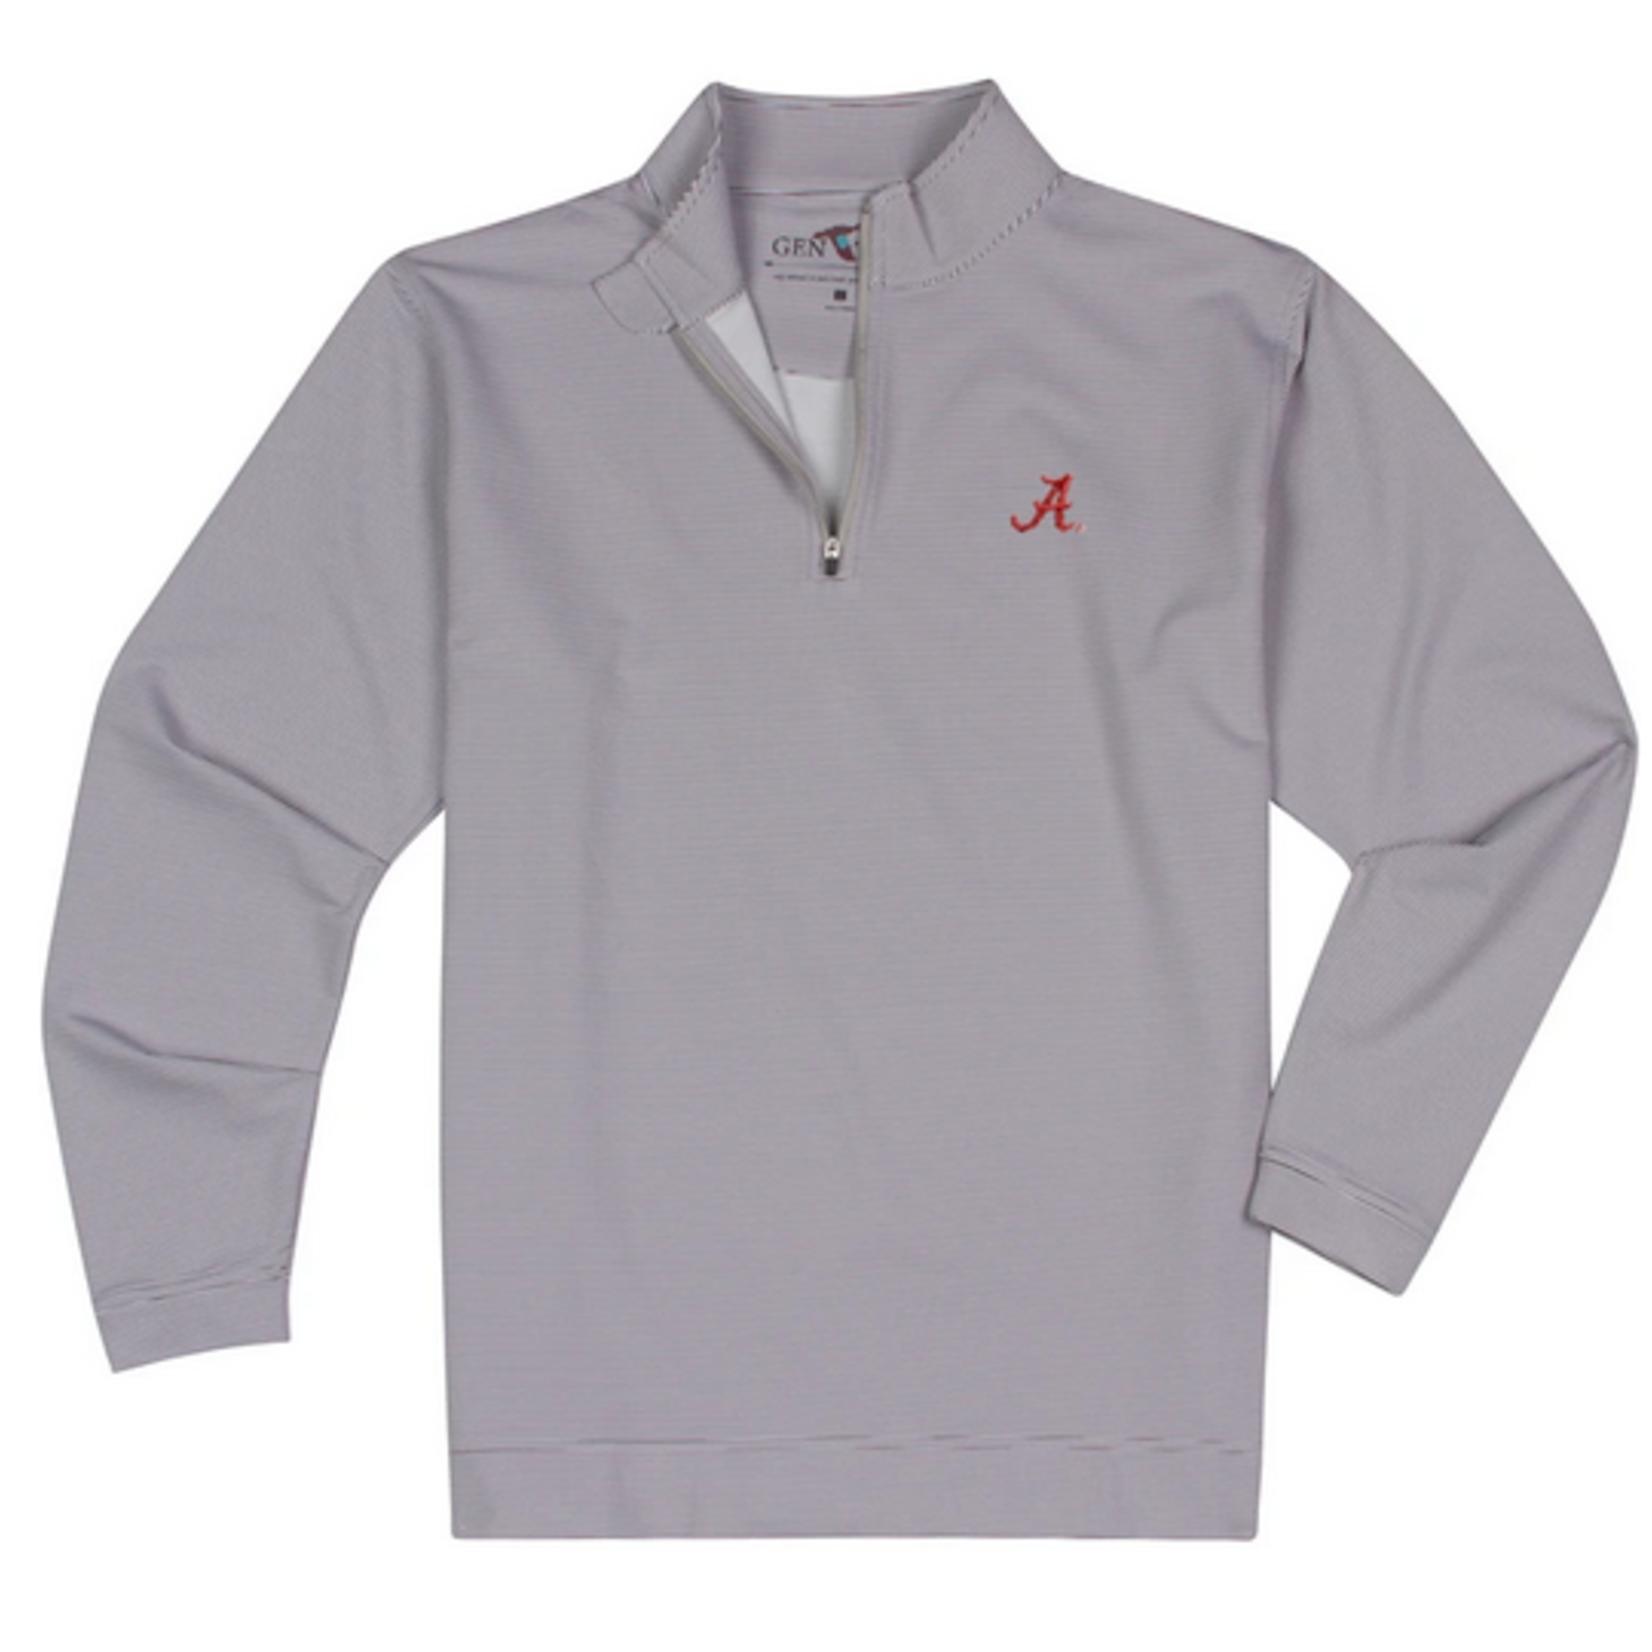 GenTeal Apparel Alabama Charcoal Pinstripe Performance Quarter-Zip